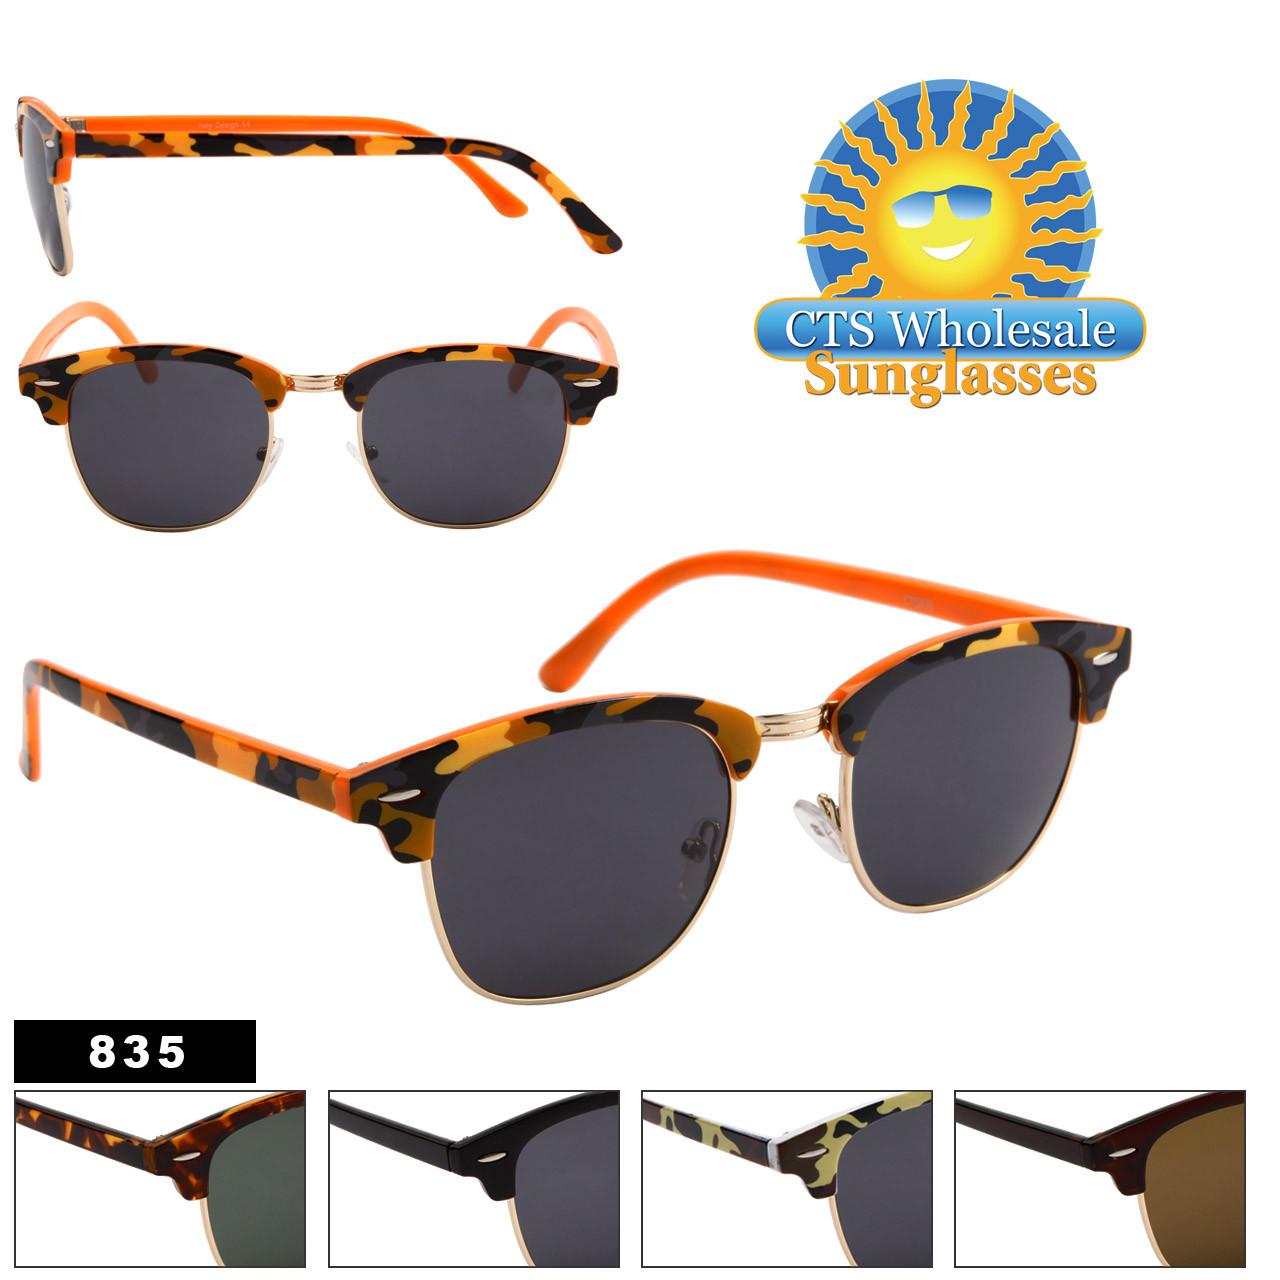 Wholesale Sunglasses by the Dozen - Style # 835